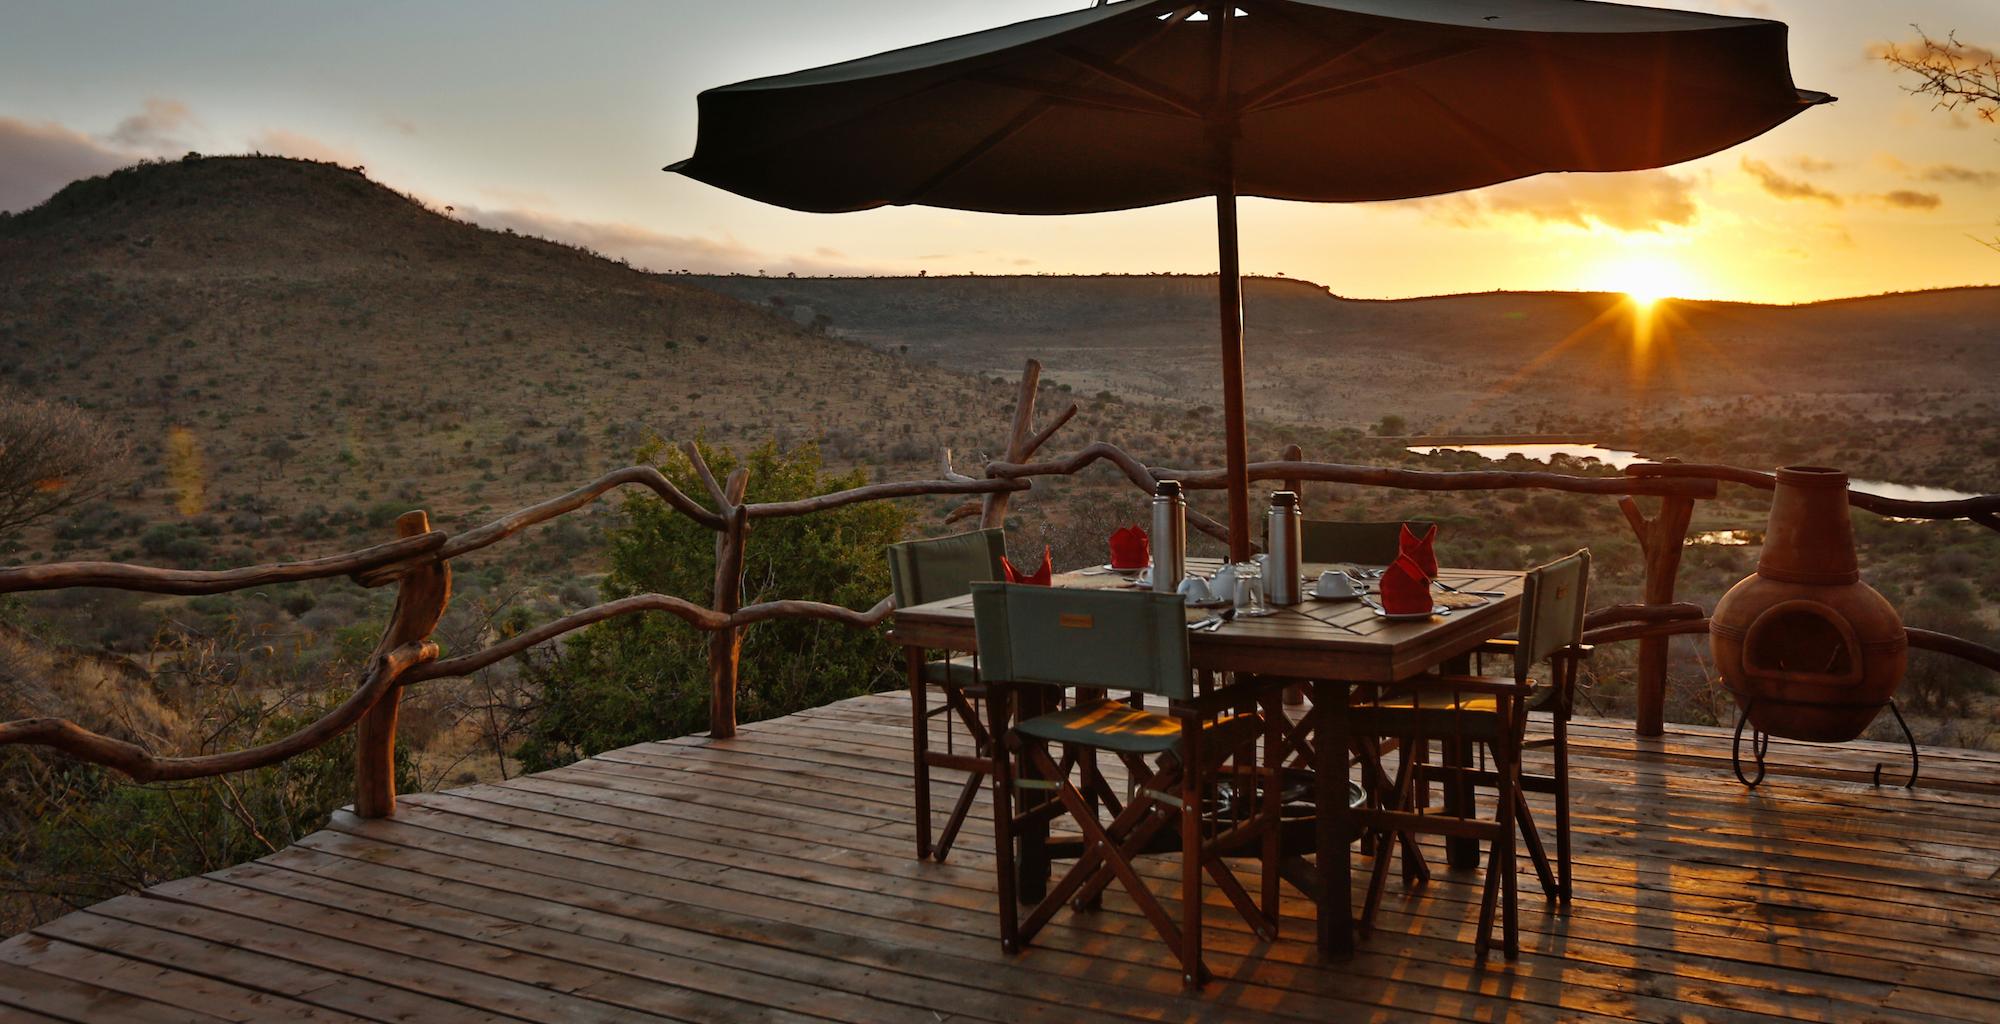 Kenya-Loisaba-Star-Beds-Outdoor-Dining